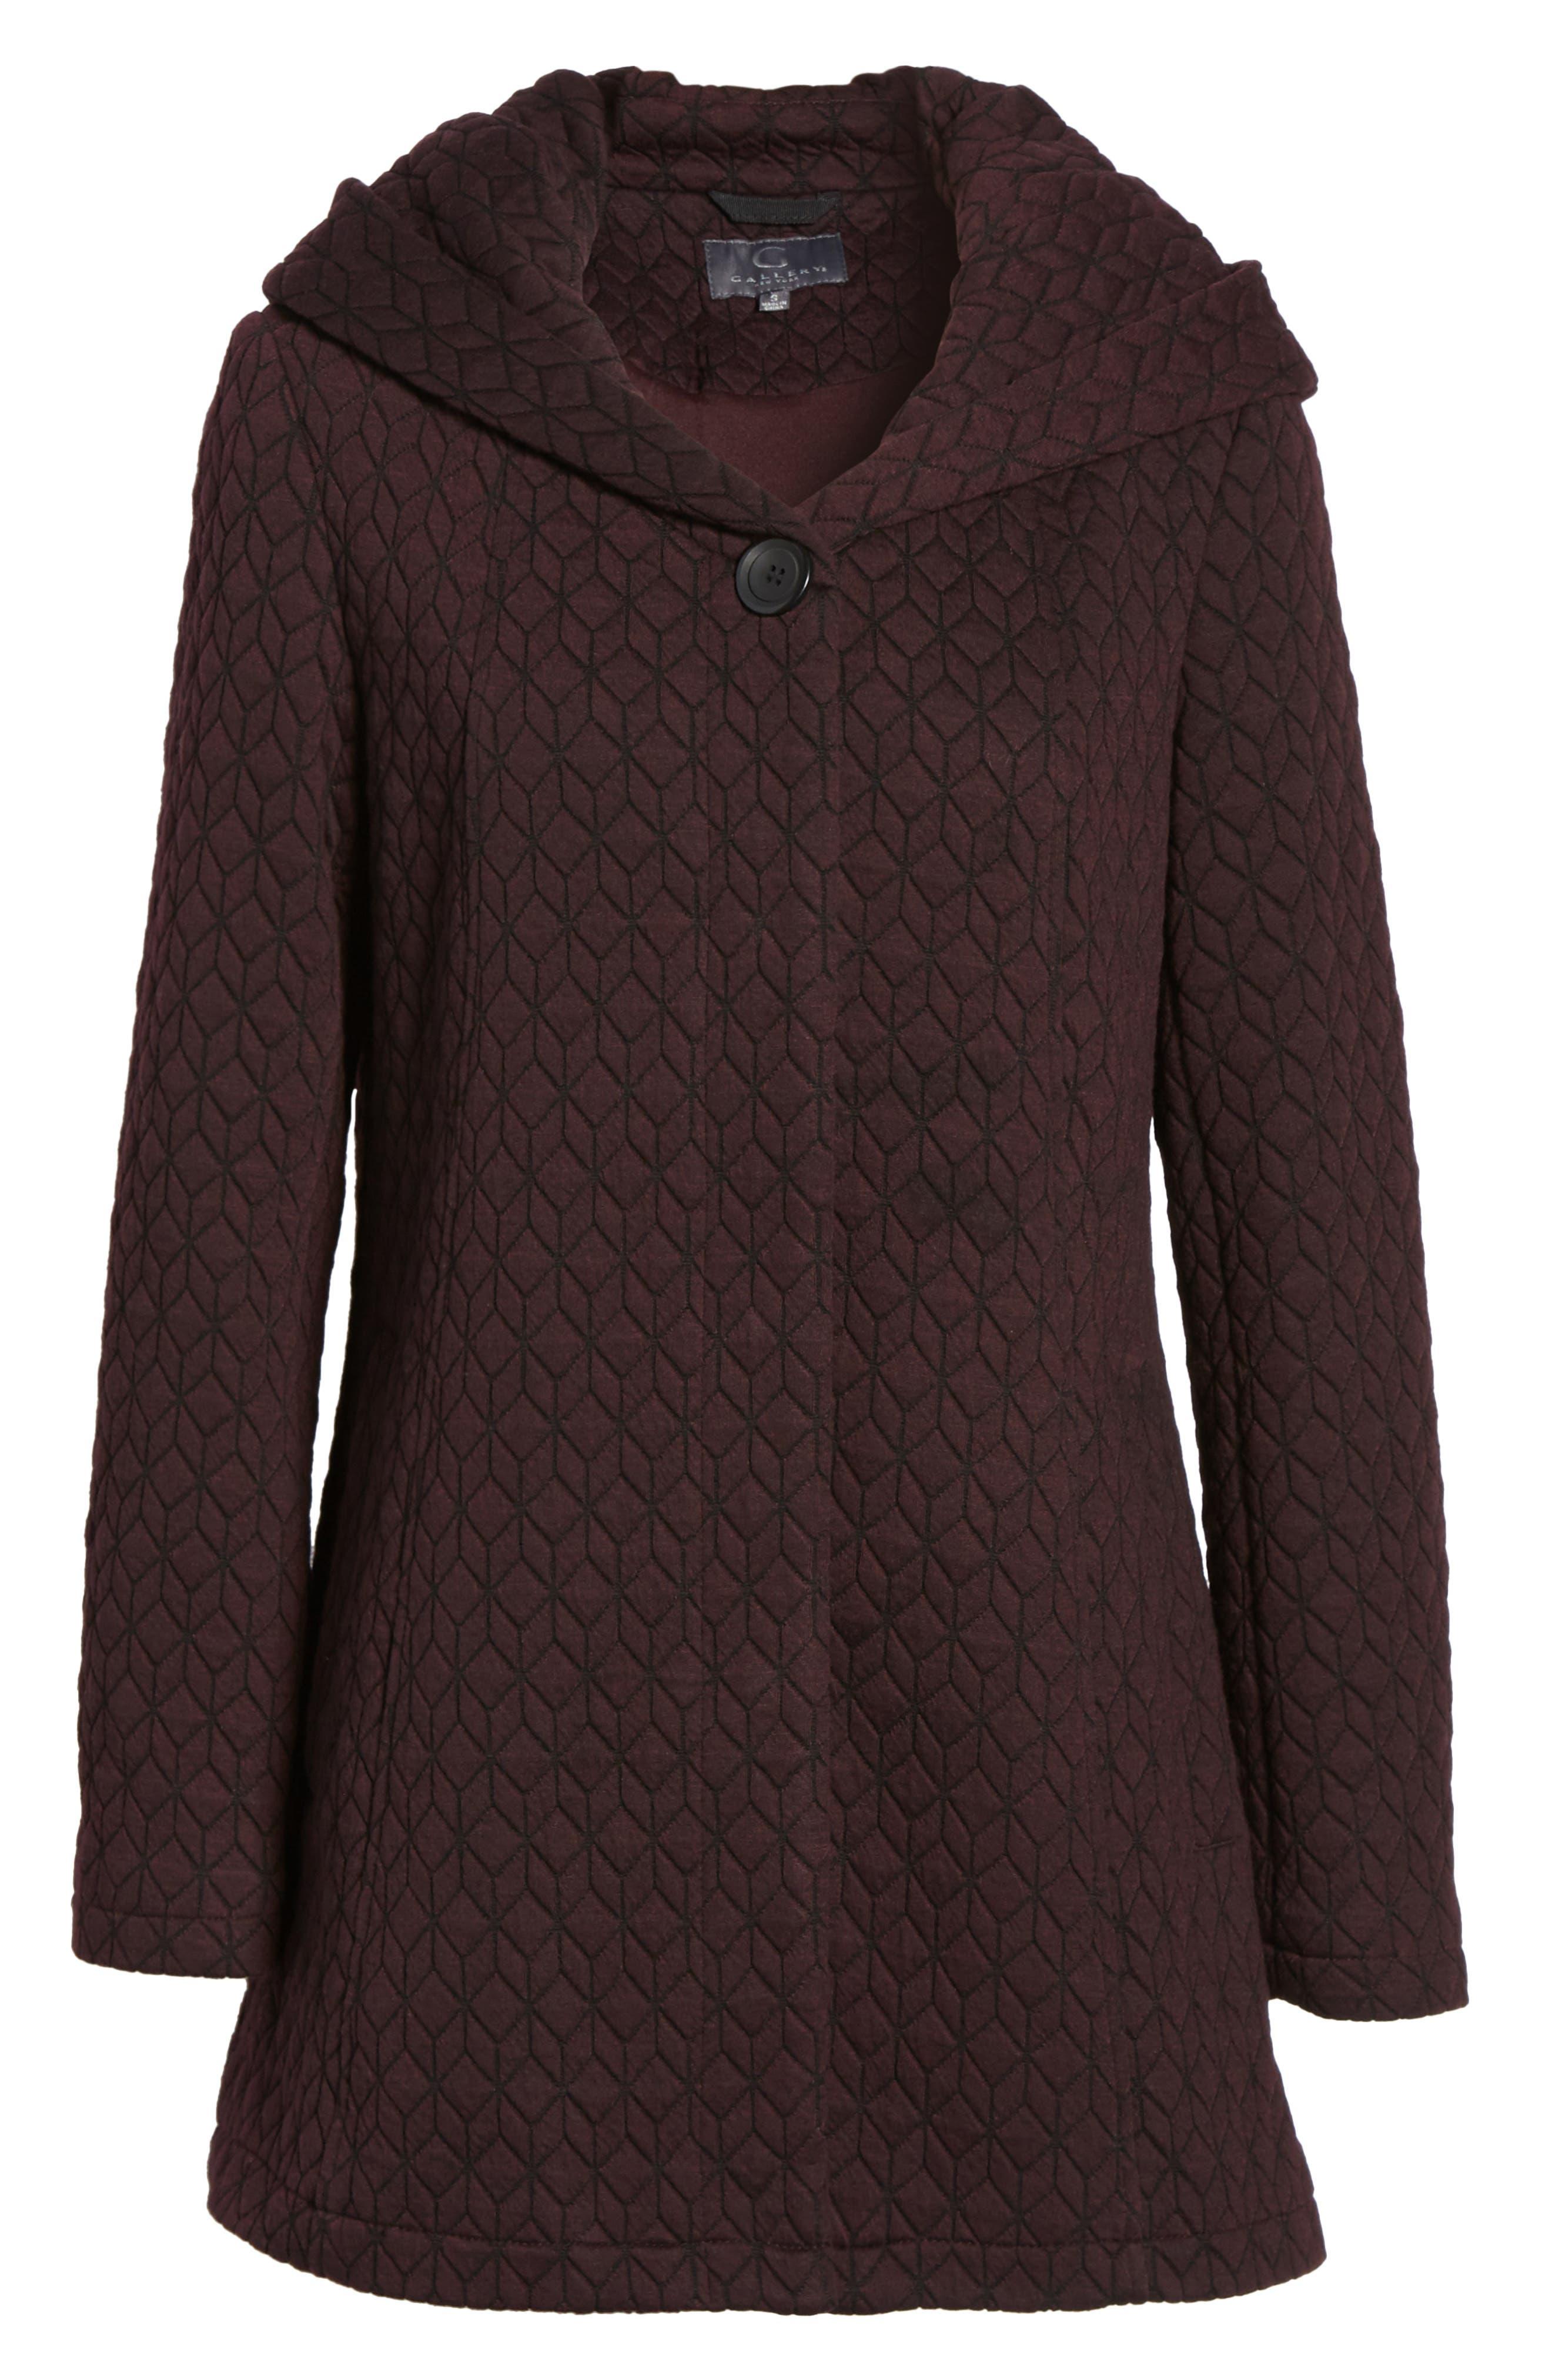 Cozy Knit Coat,                             Alternate thumbnail 6, color,                             Burgundy